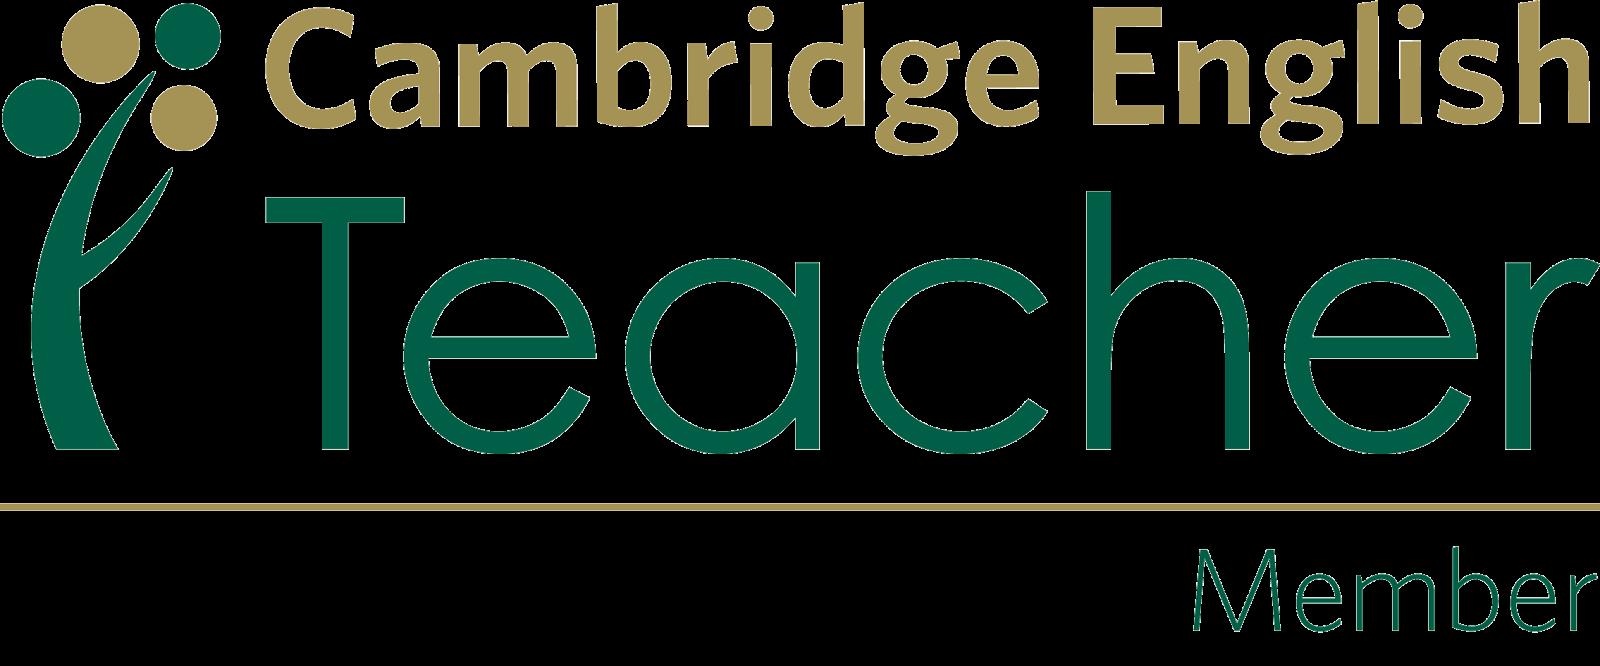 Cambridge English Teacher Member